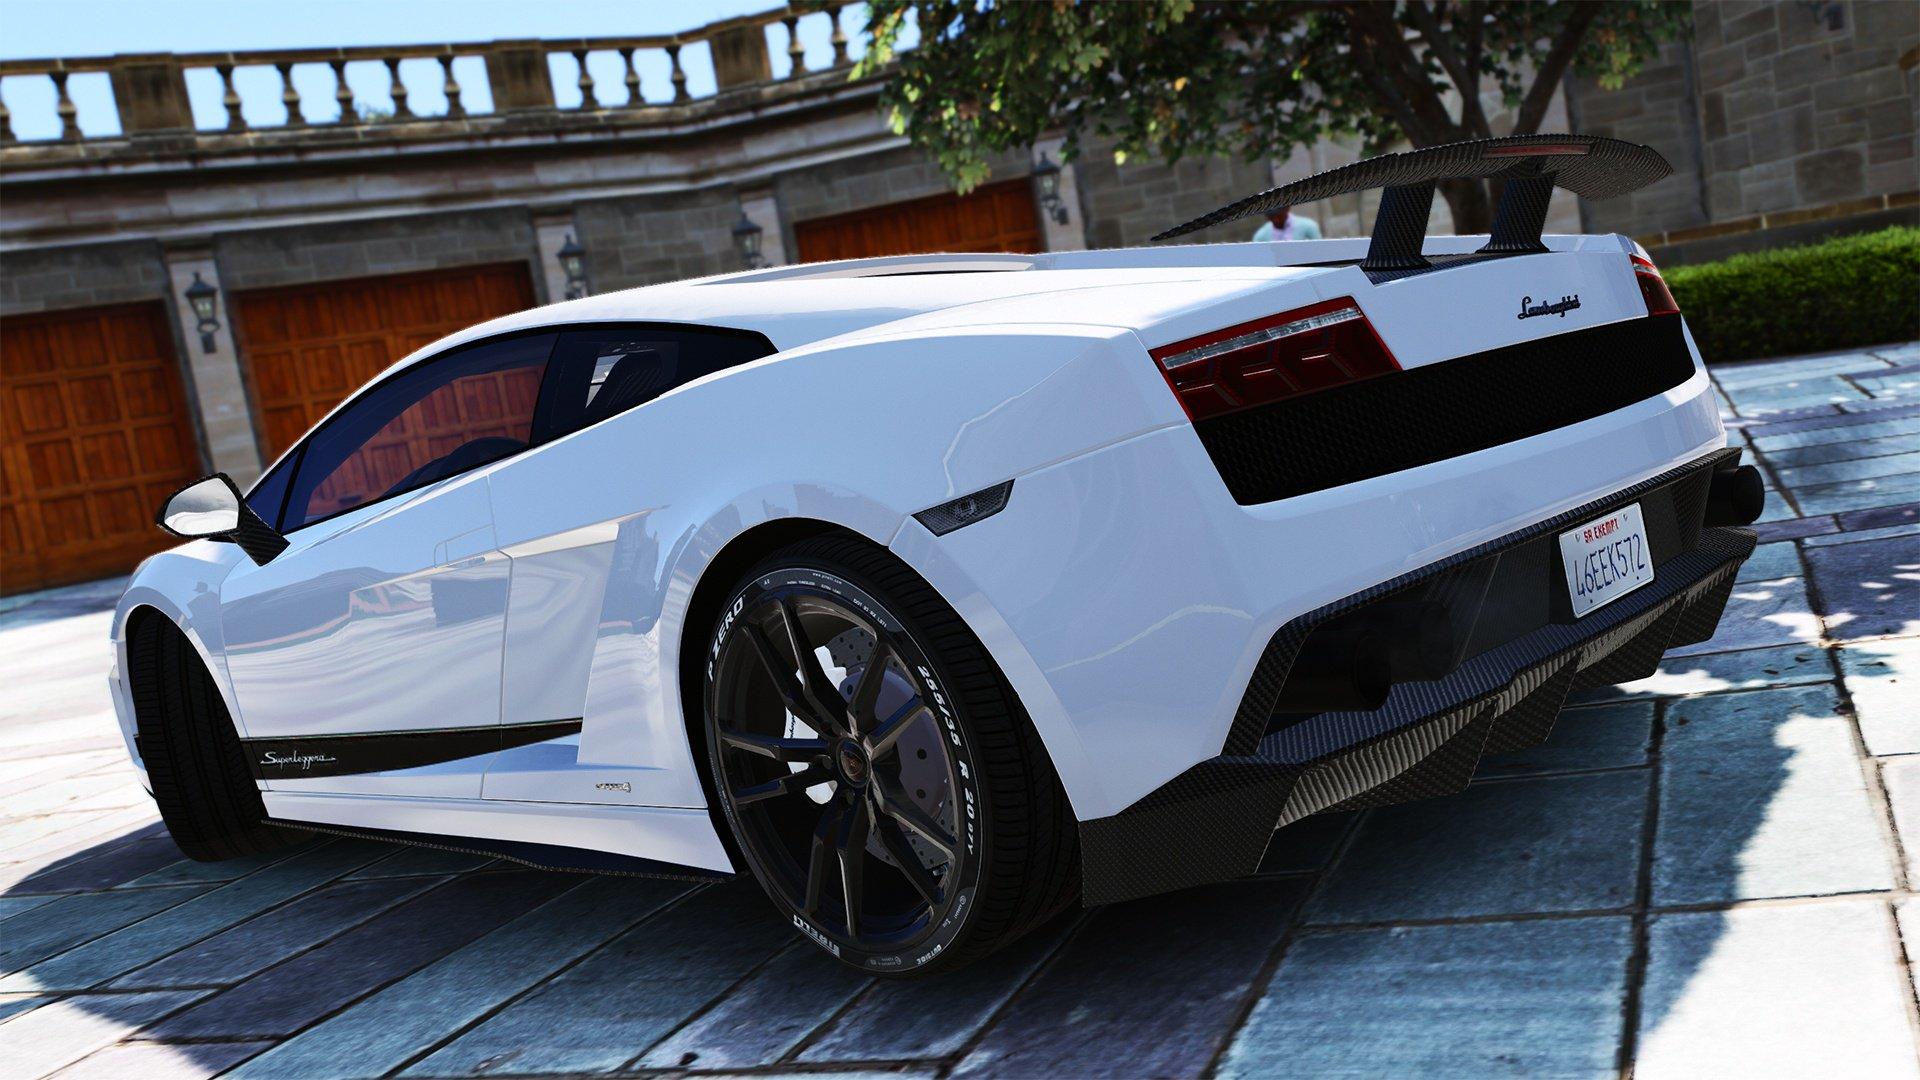 Lamborghini Gallardo Superleggera Lp 570 4 Add On Vehicules Pour Gta V Sur Gta Modding